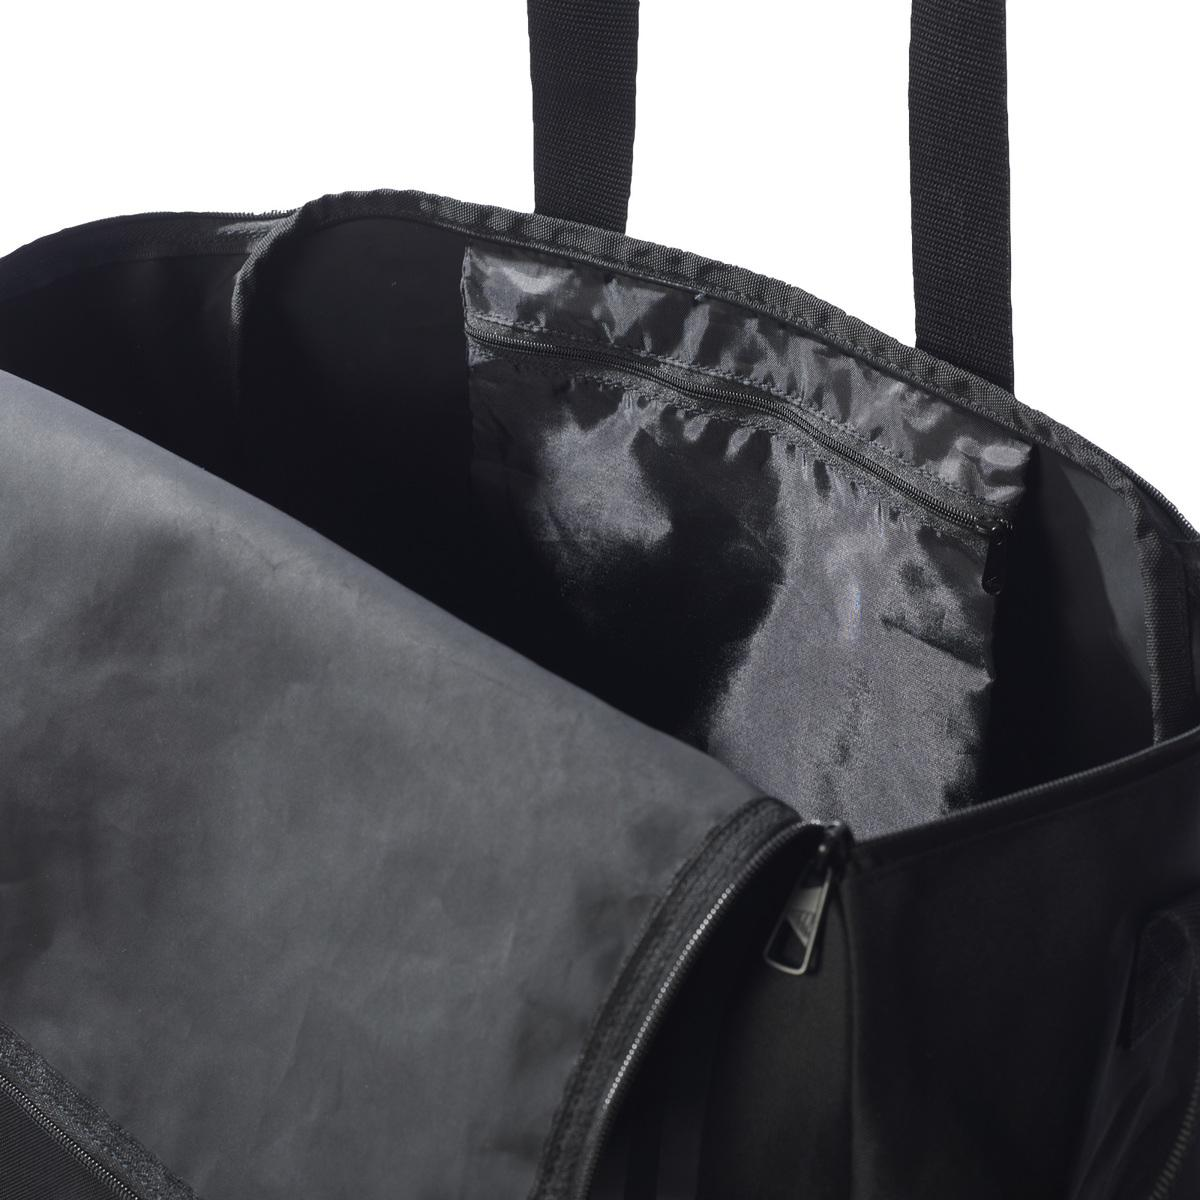 2fe025e3cb Lyst - Tiro Teambag BC S femmes Sac de sport en Noir adidas pour ...